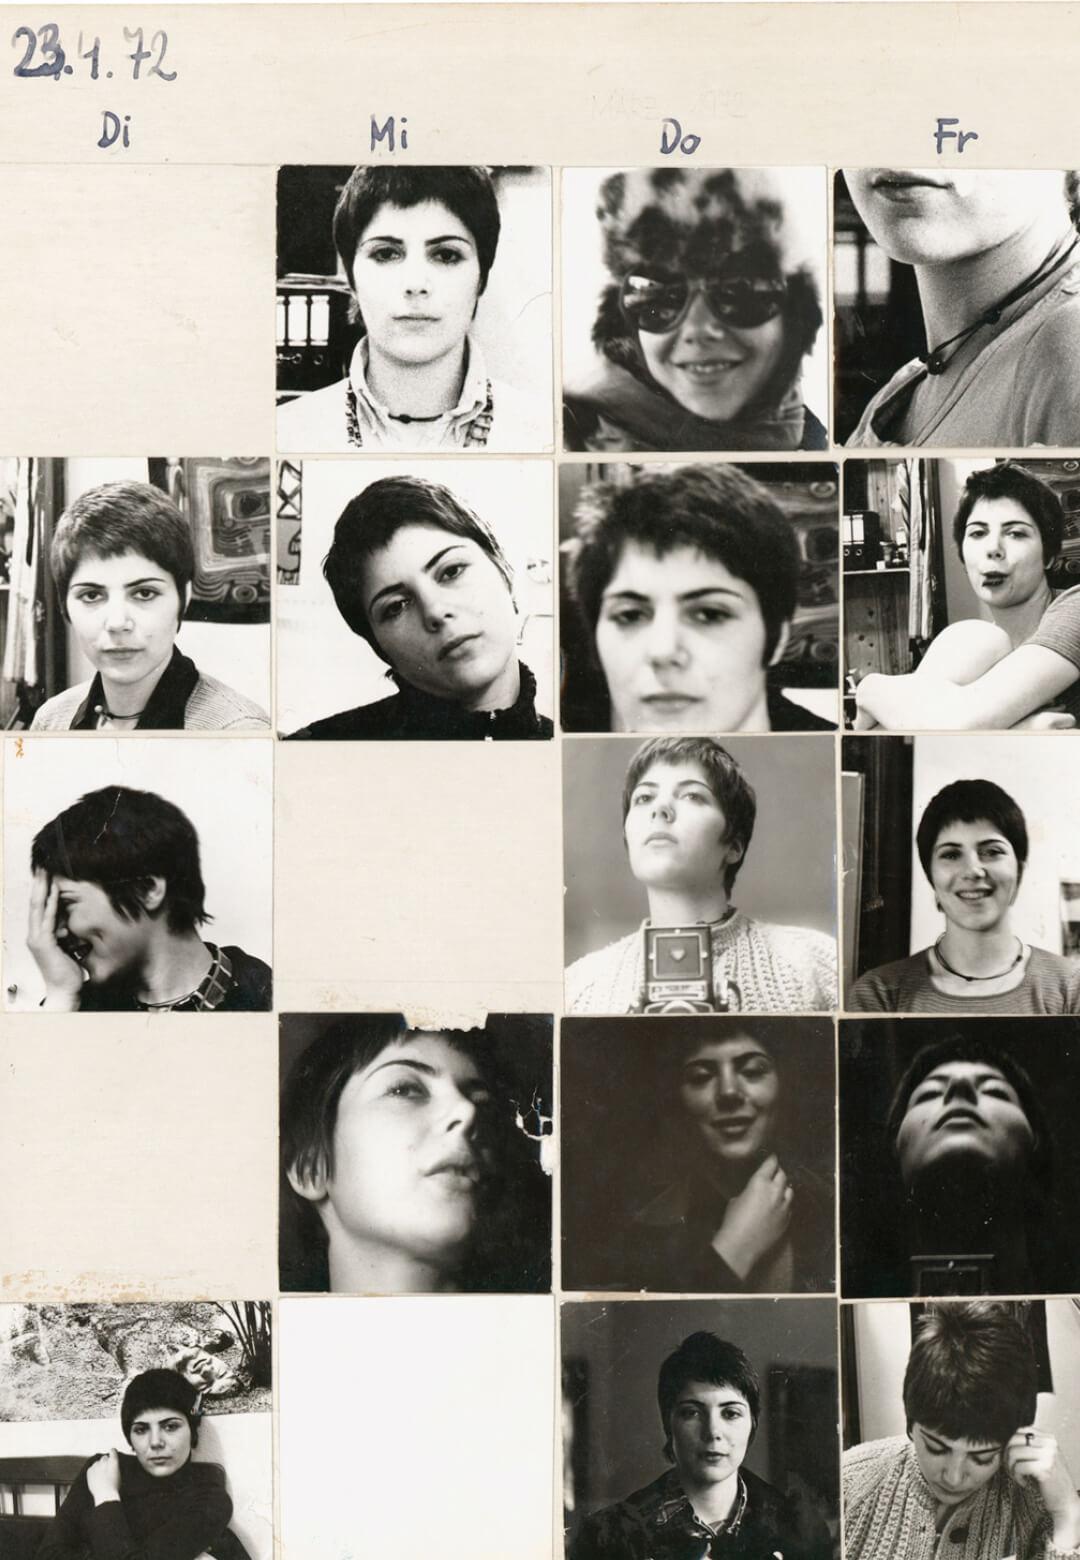 Friedl Kubelka's 'Das erste Jahresportrait', 1972/73 (The First Year Portrait) is the result of her daily self-documentation over a one-year span | Werner Kaligofsky | STIRworld